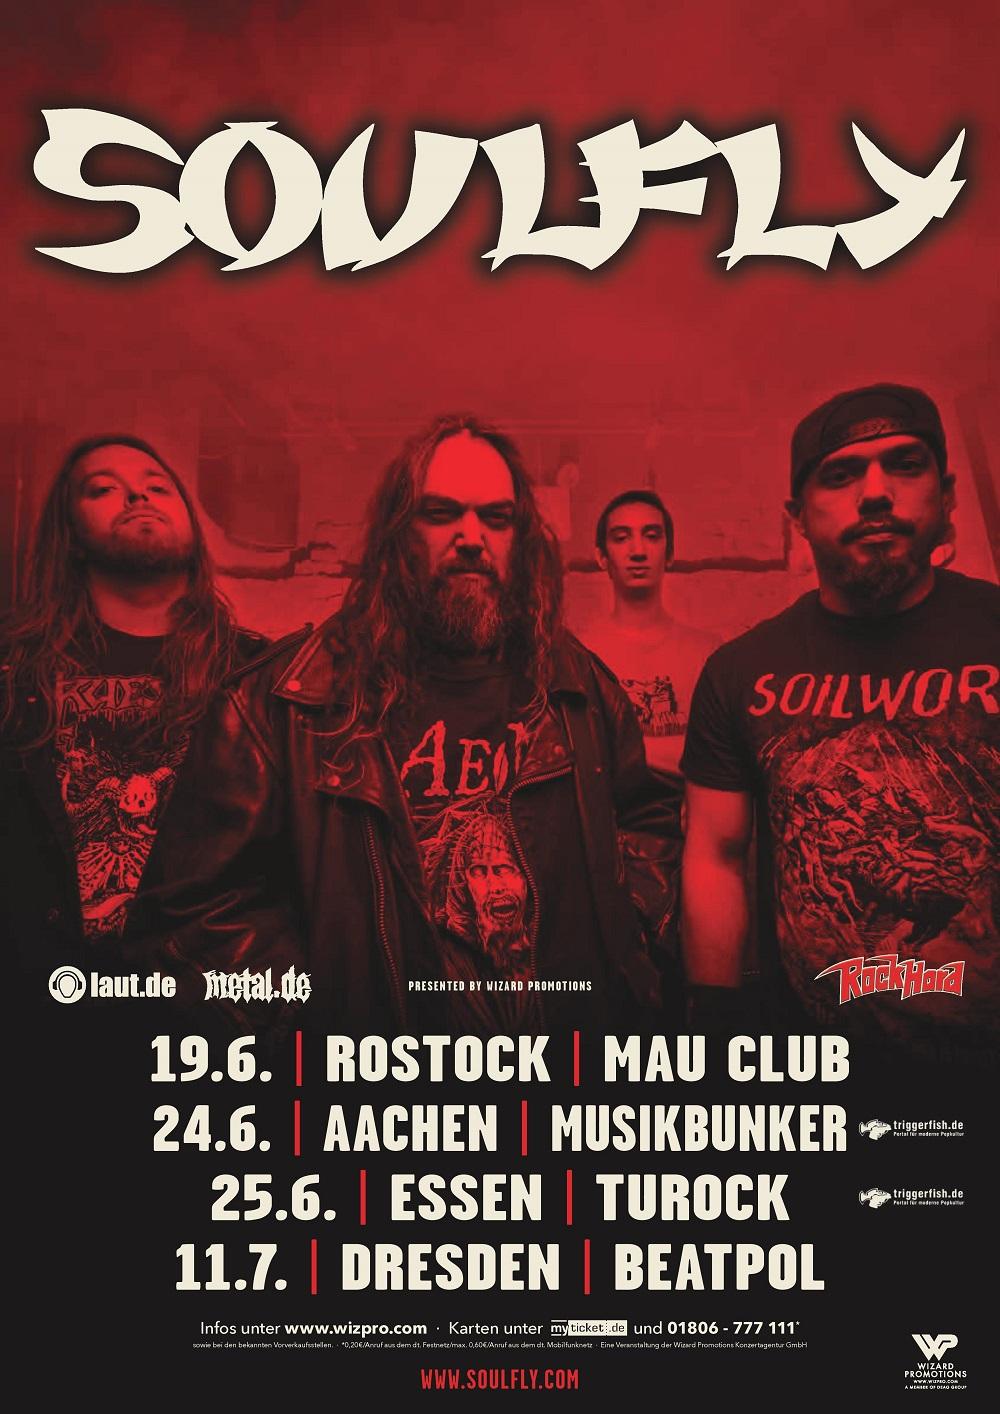 Bild Soulfly Tourposter 2018